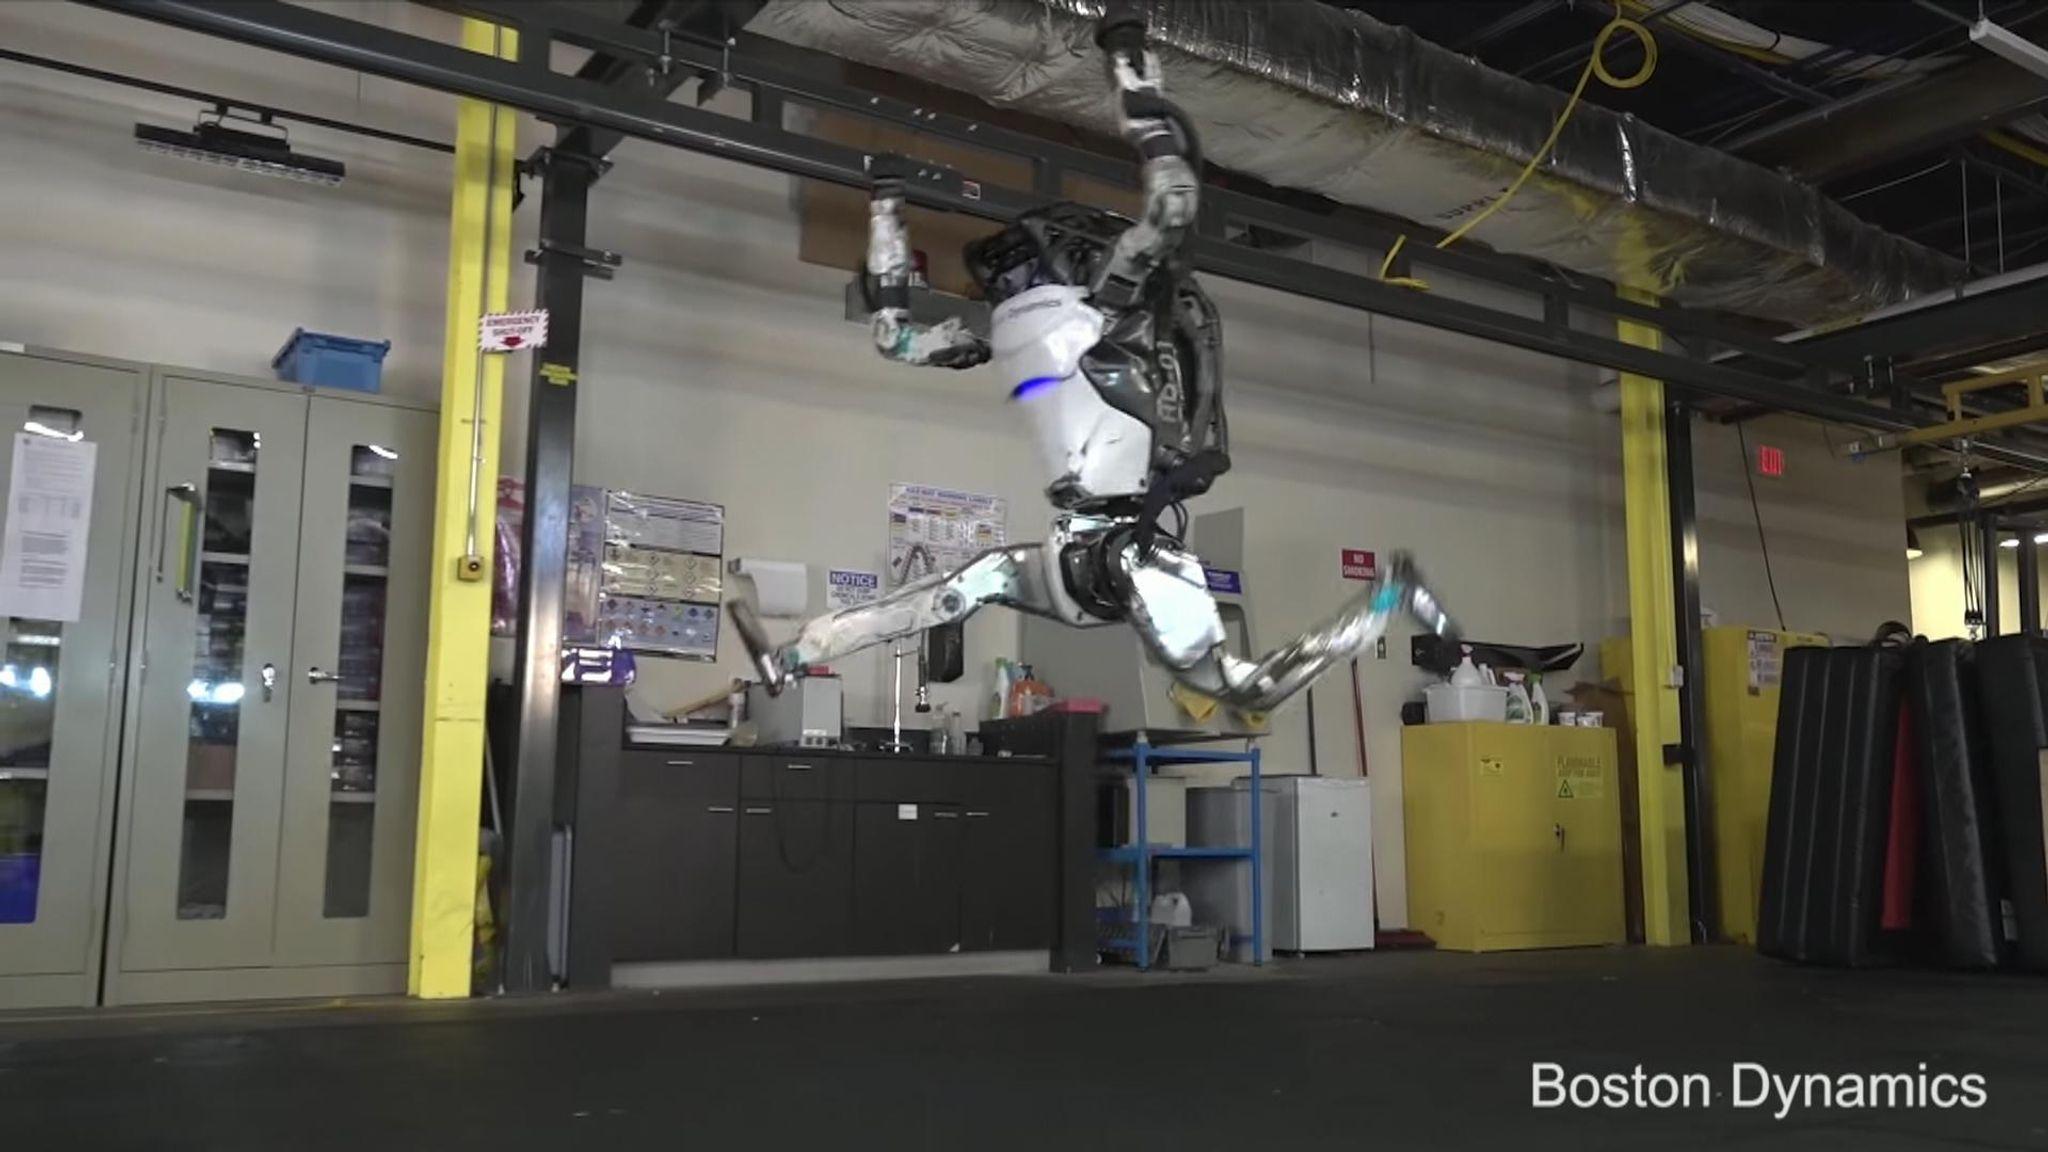 Boston Dynamics Atlas robot does gymnastics